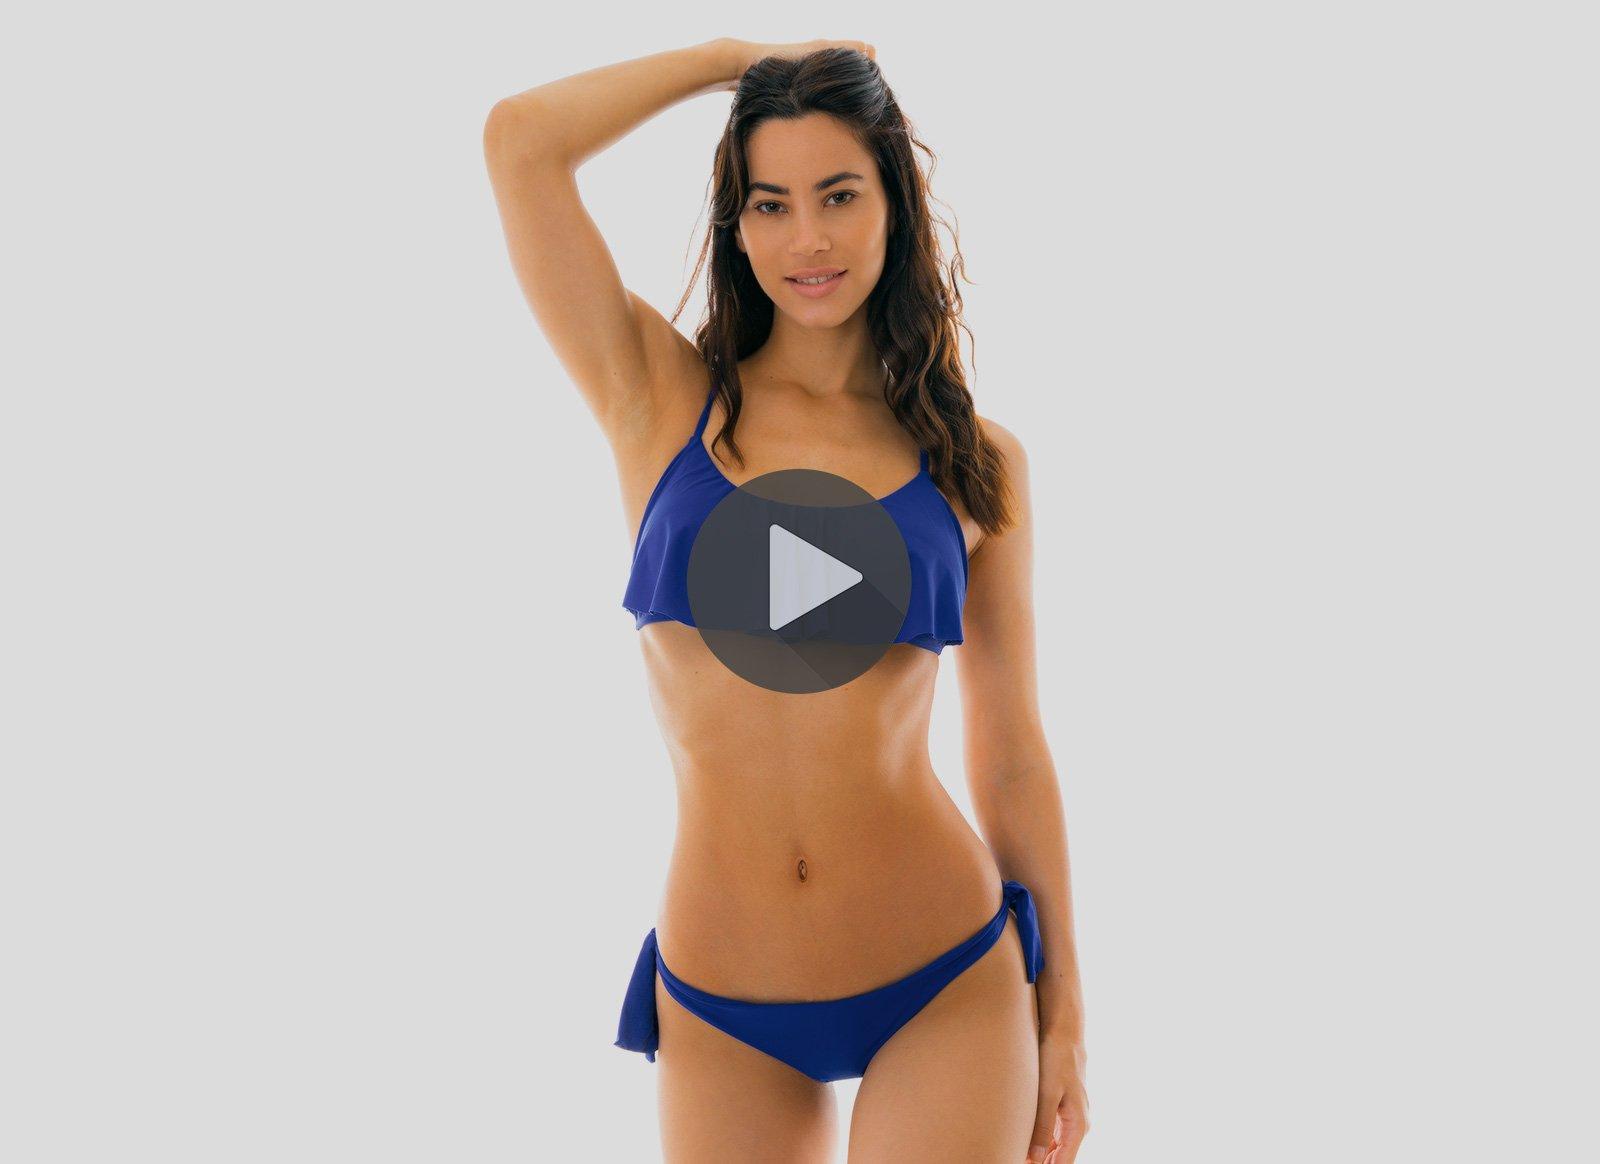 737a4f41079 Turquoise Swimsuit & swimwear | Light blue & Navy bikini